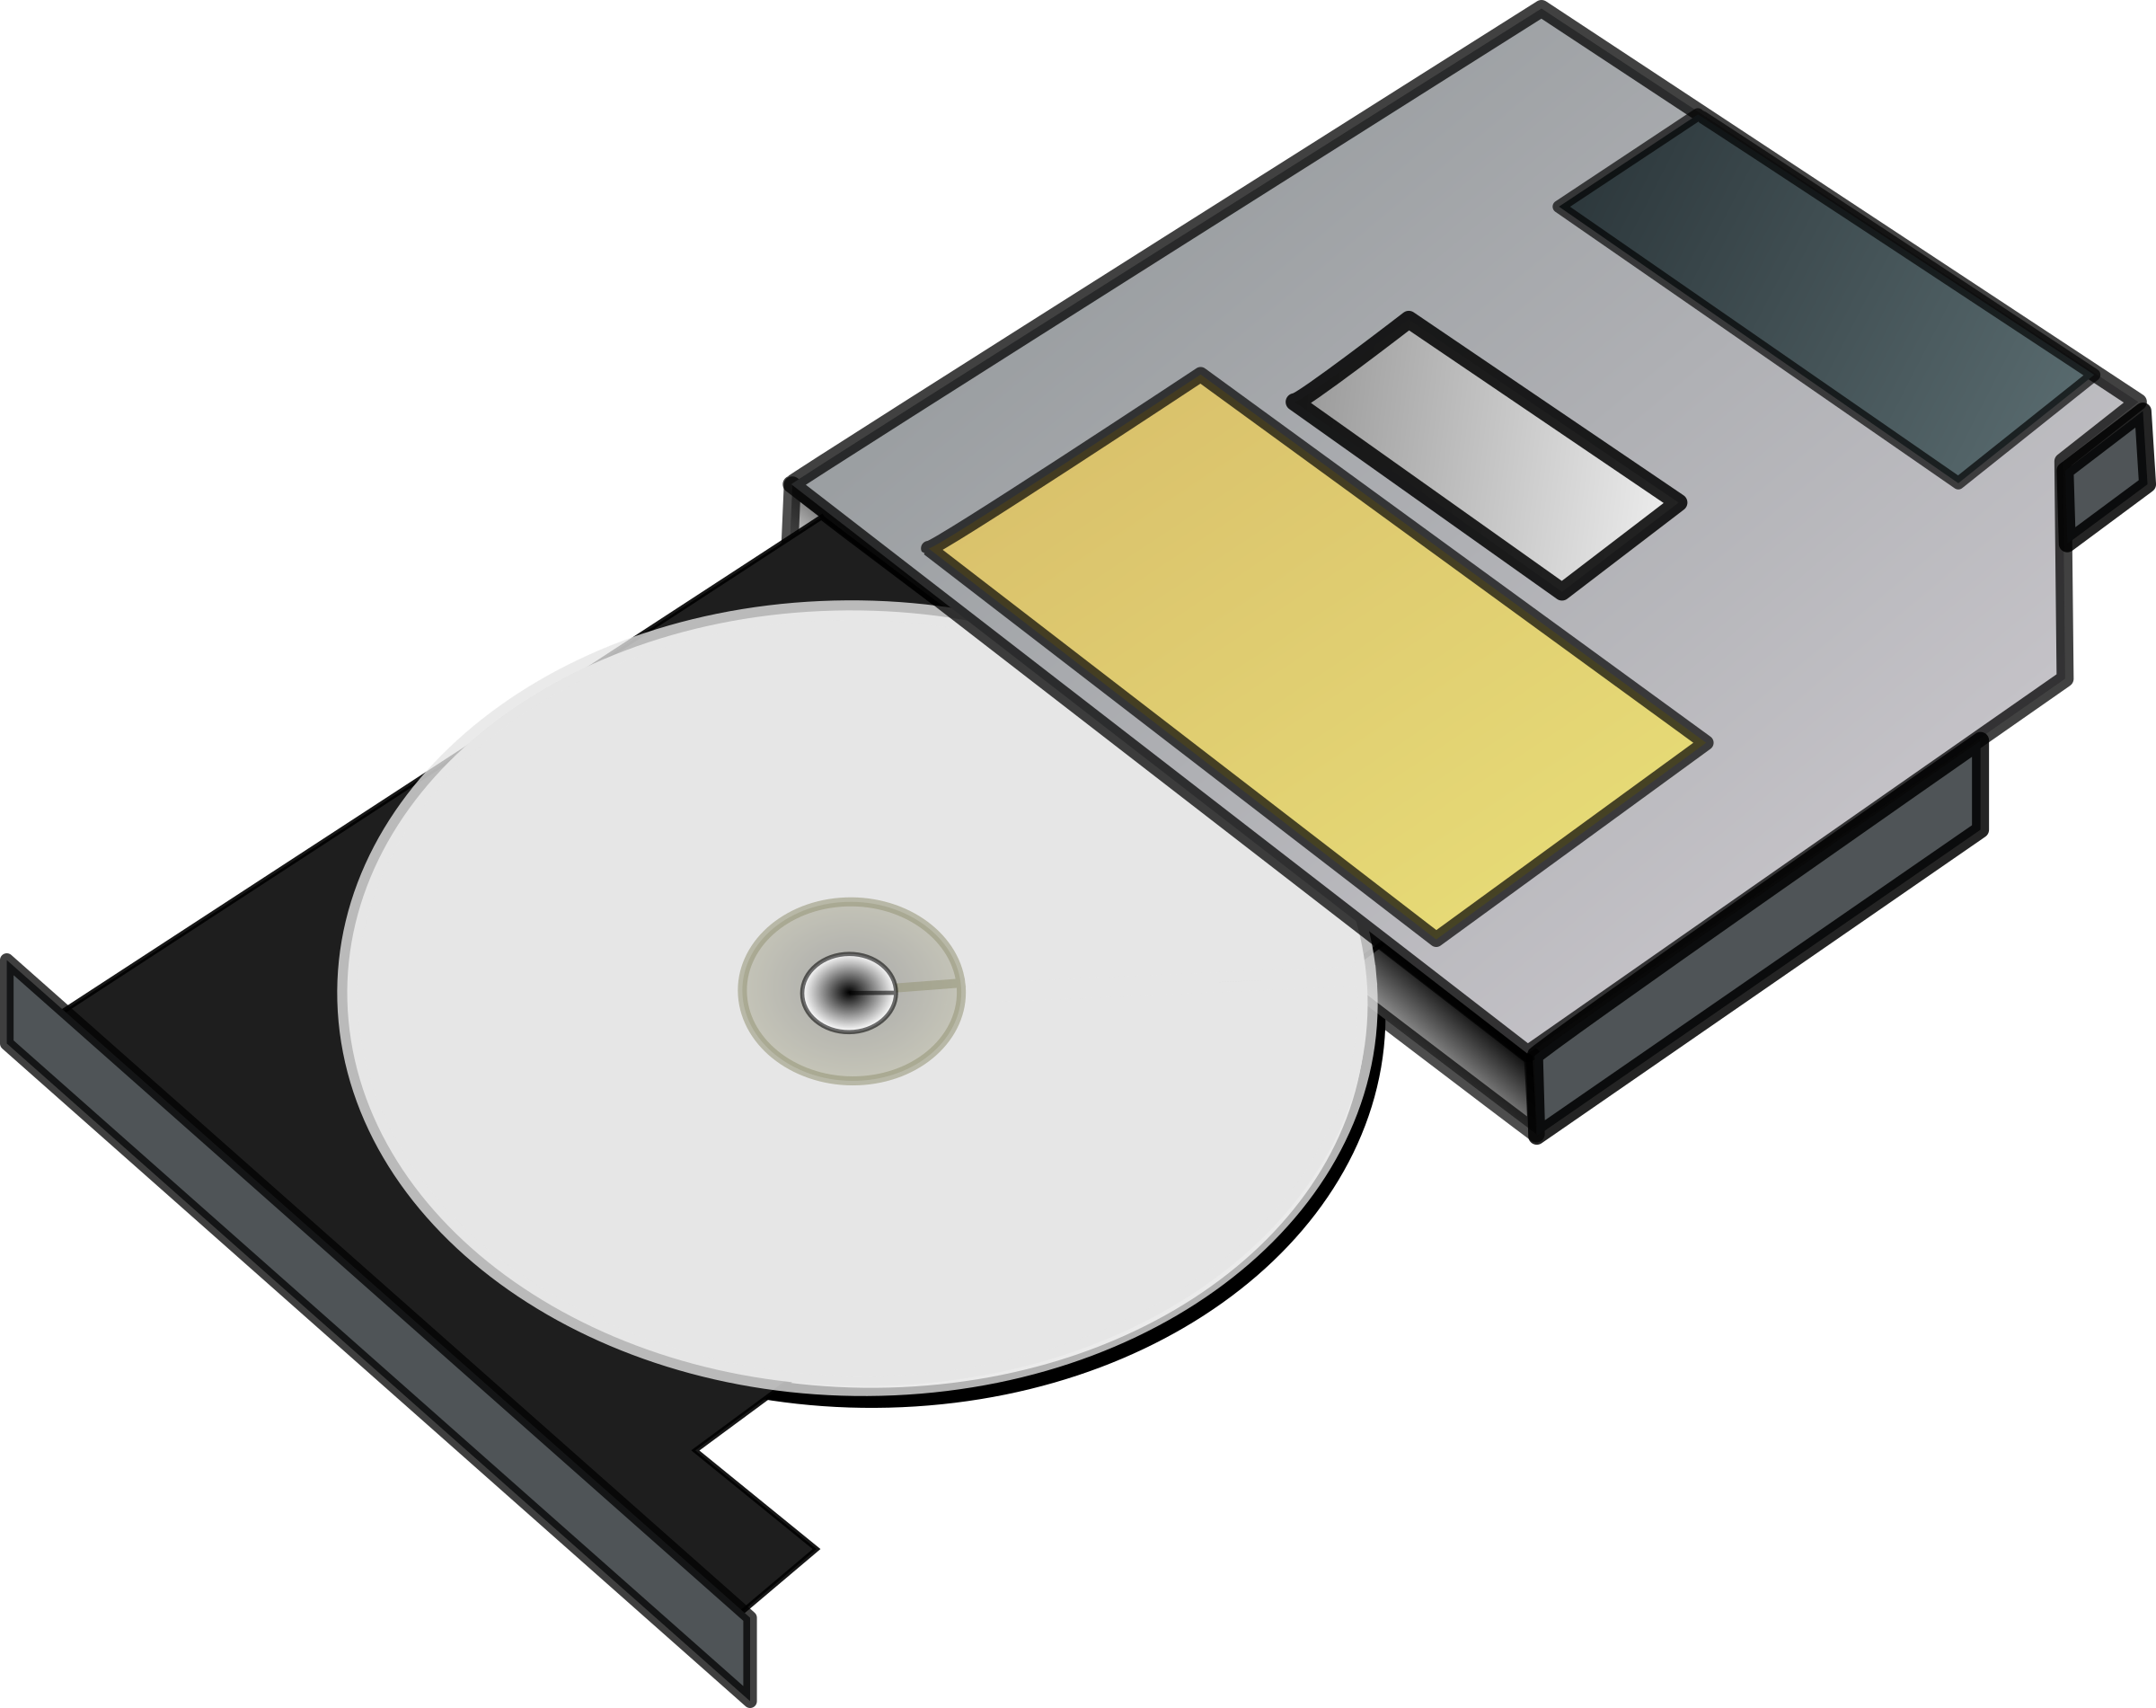 Electronics clipart vector. Storage medium clipground